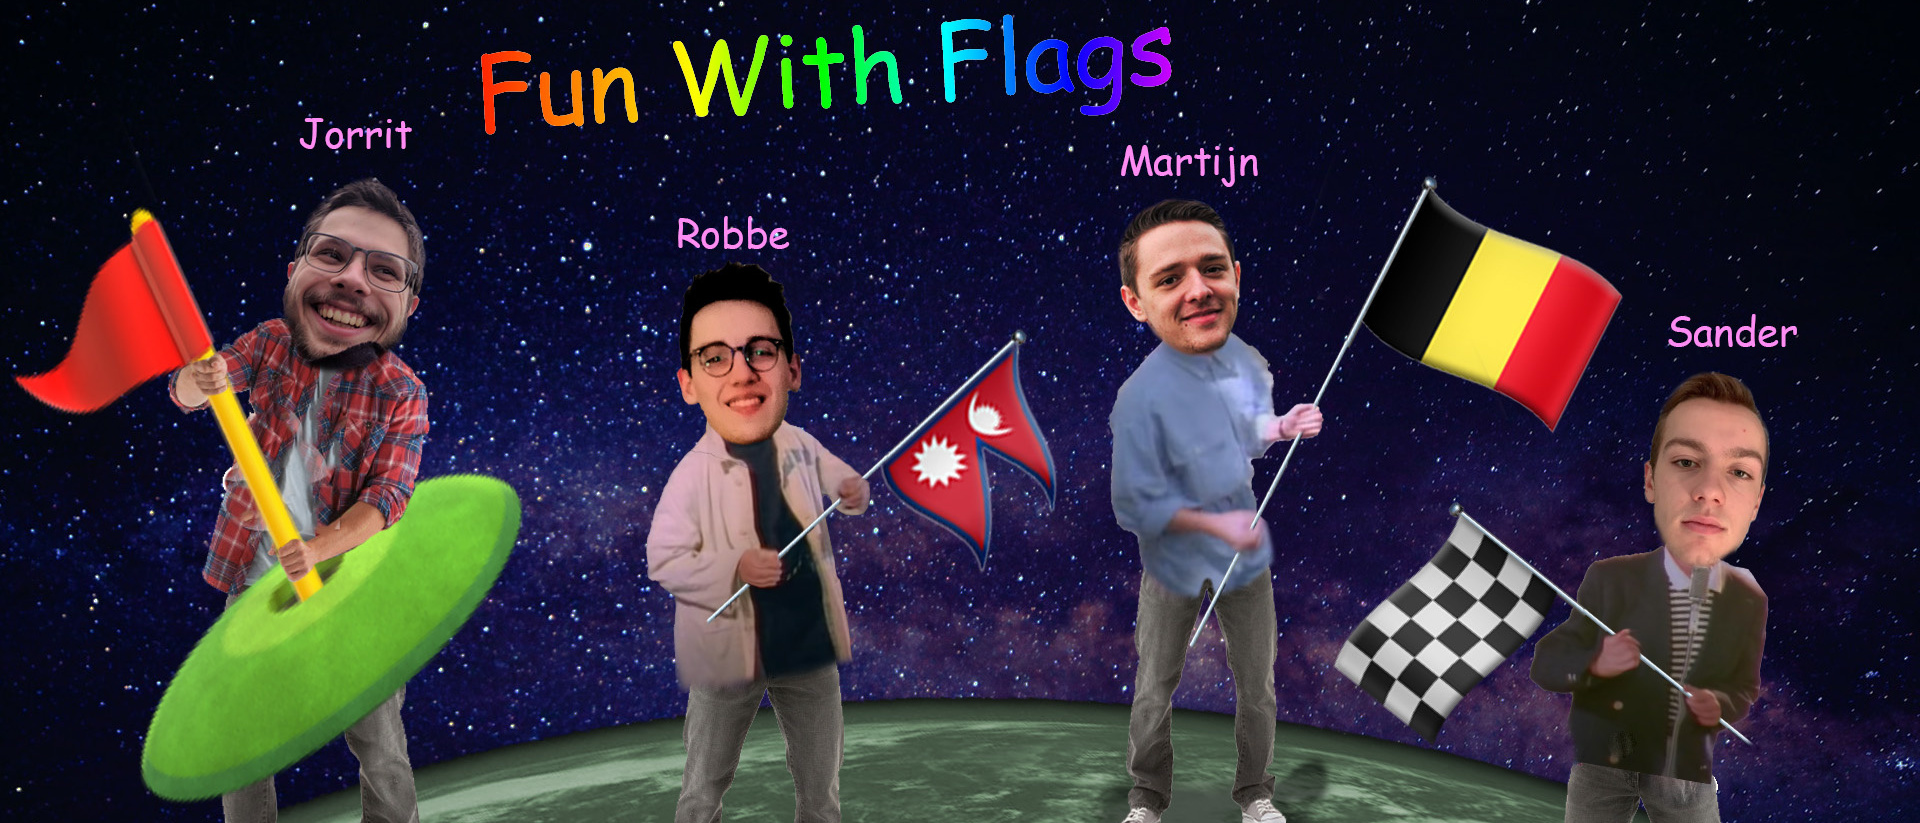 Het winnende team 'Fun With Flags', CSCBE